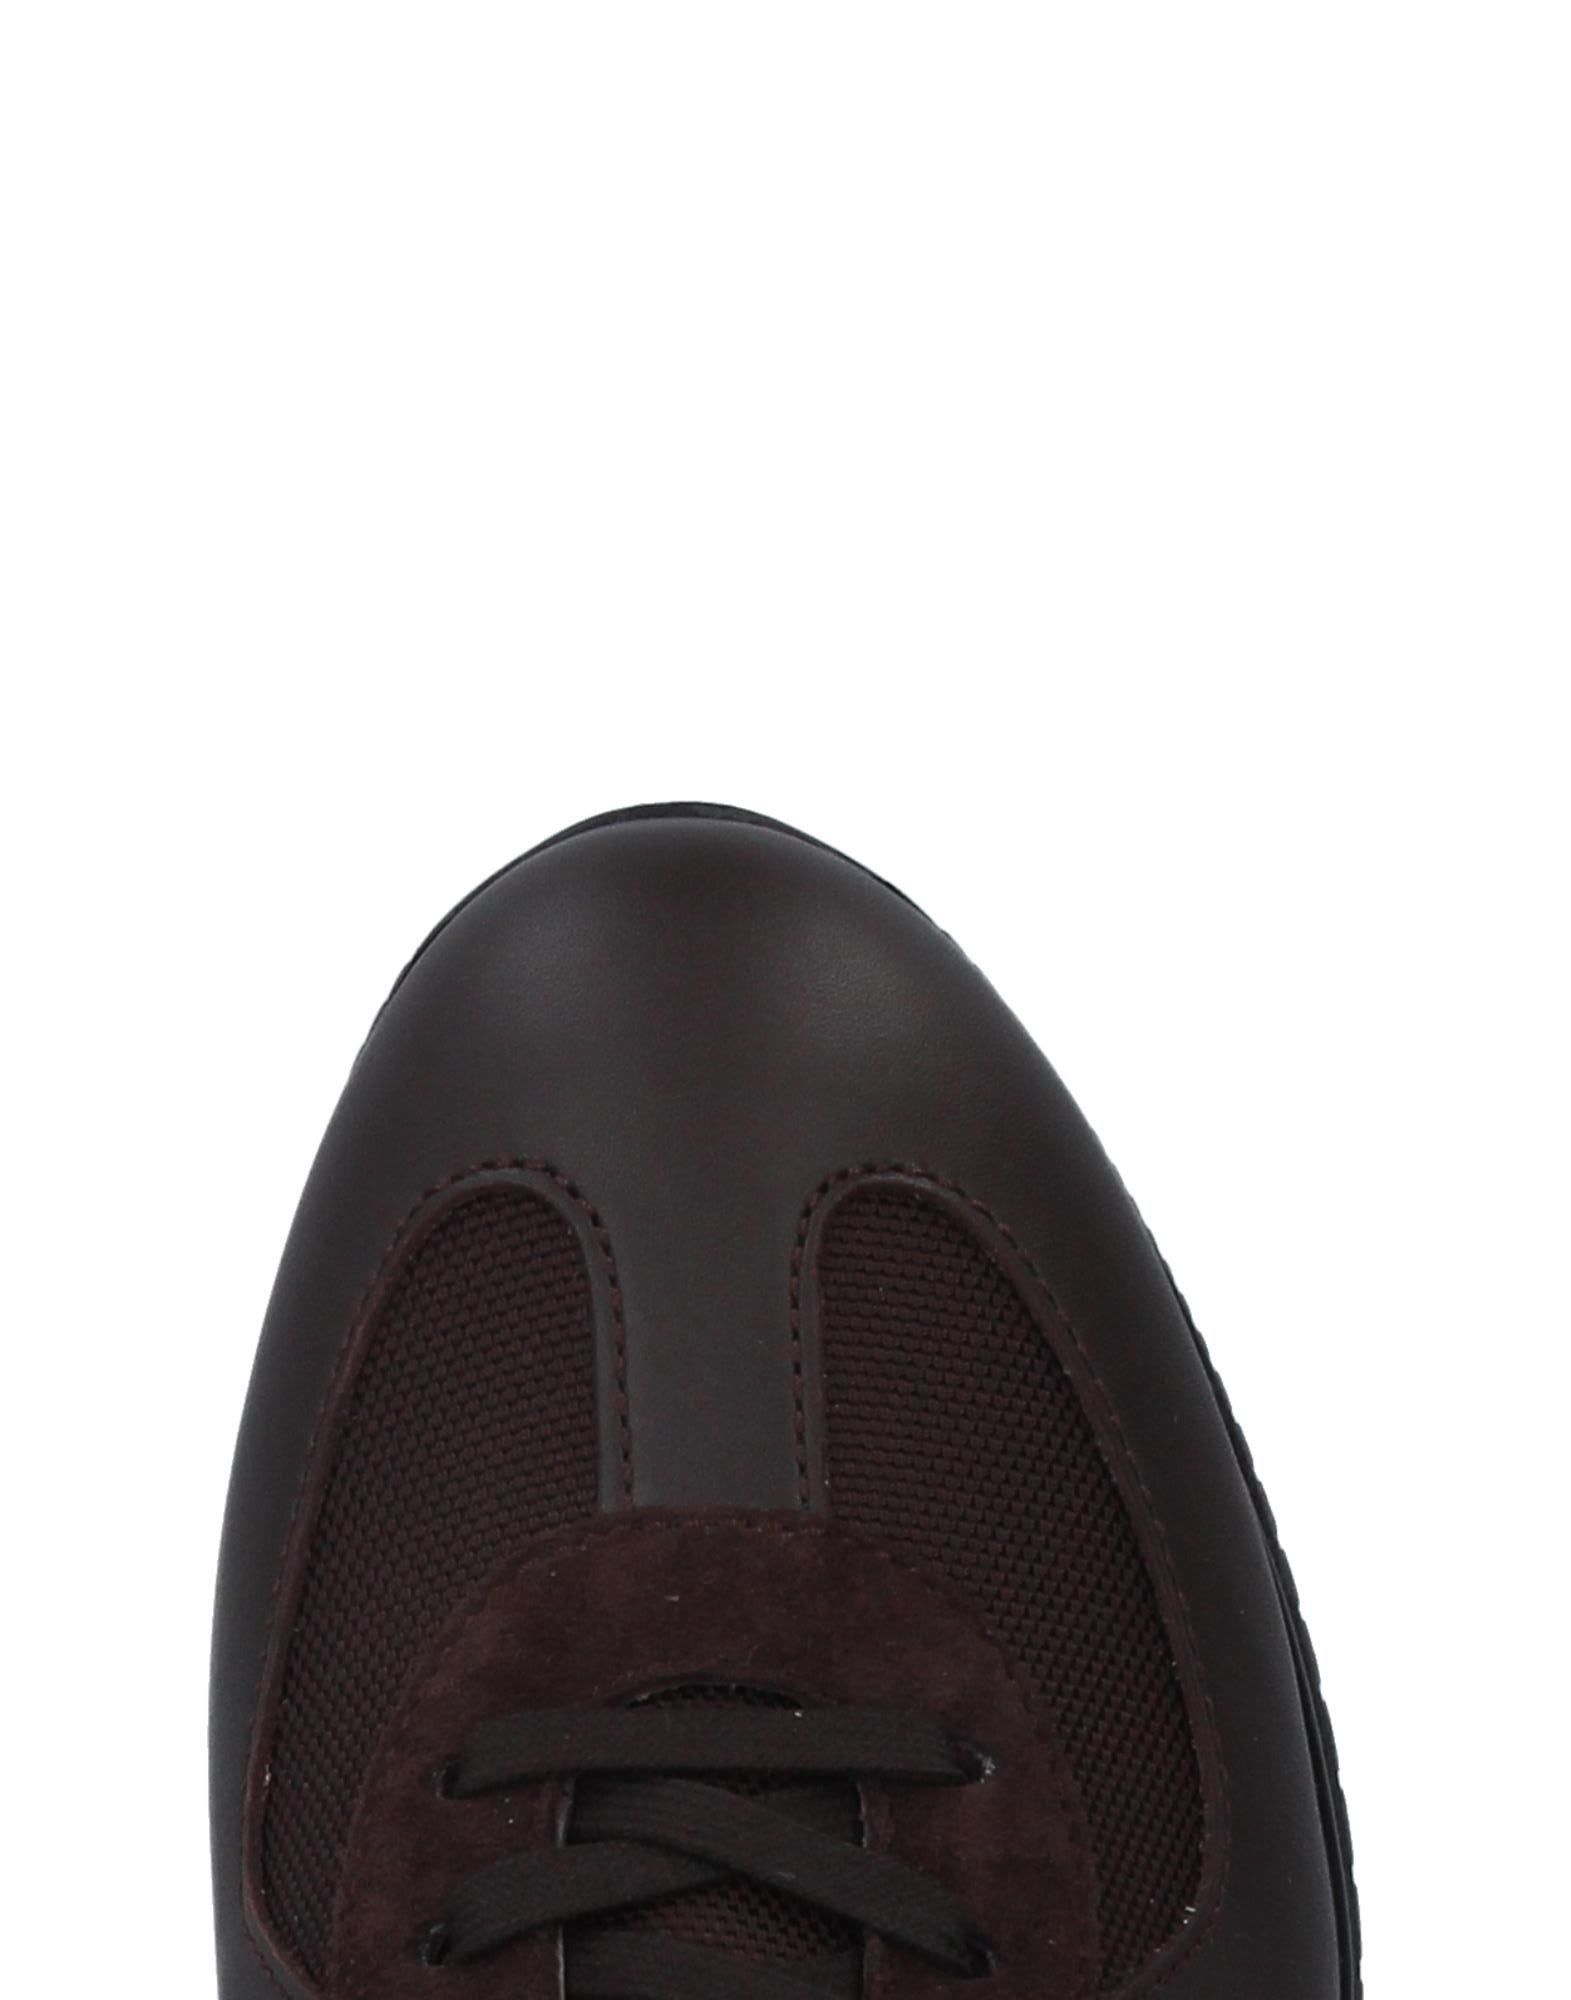 Hogan Sneakers Herren  11310878DF Gute Qualität beliebte Schuhe